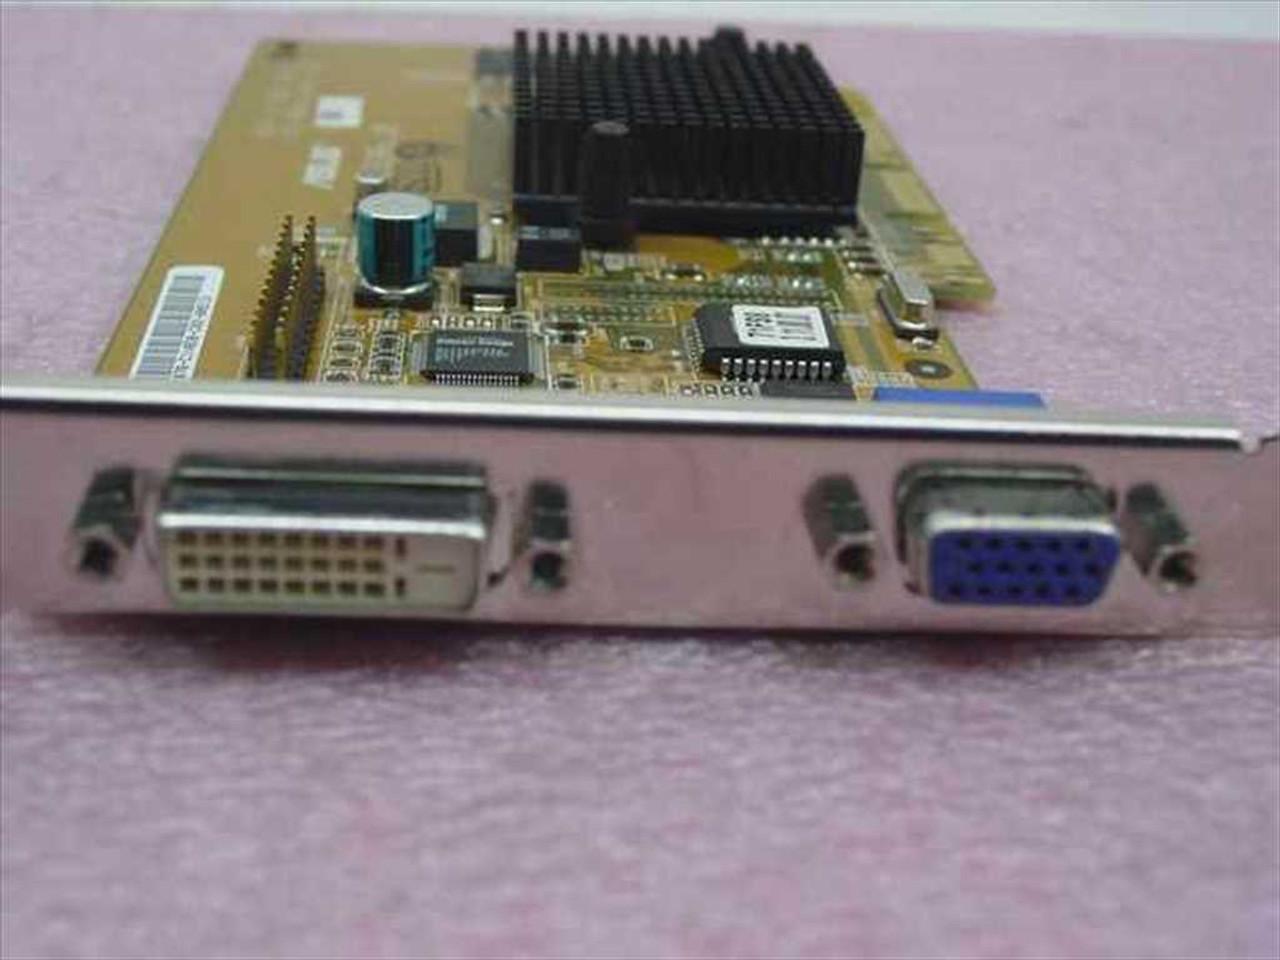 ASUS AGP-V7100 DVI SDRAM WINDOWS 7 X64 DRIVER